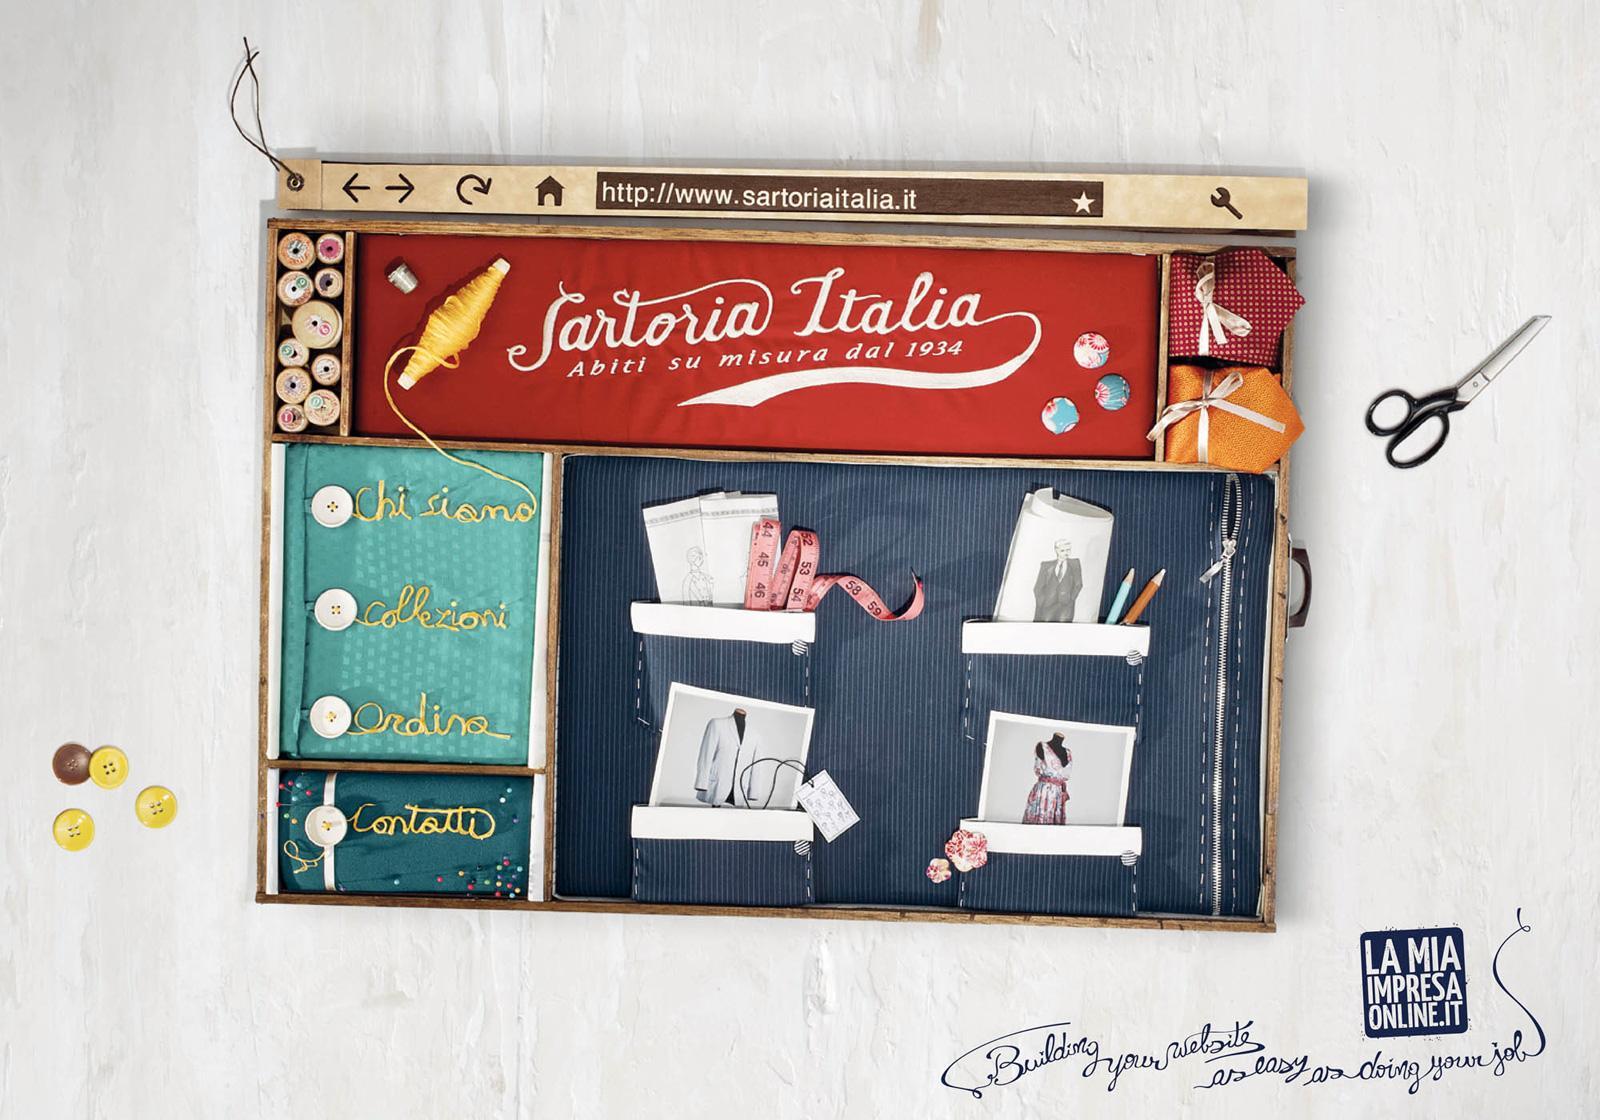 LaMiaImpresaOnline Print Ad -  Building your Web Business, Sartoria Italia